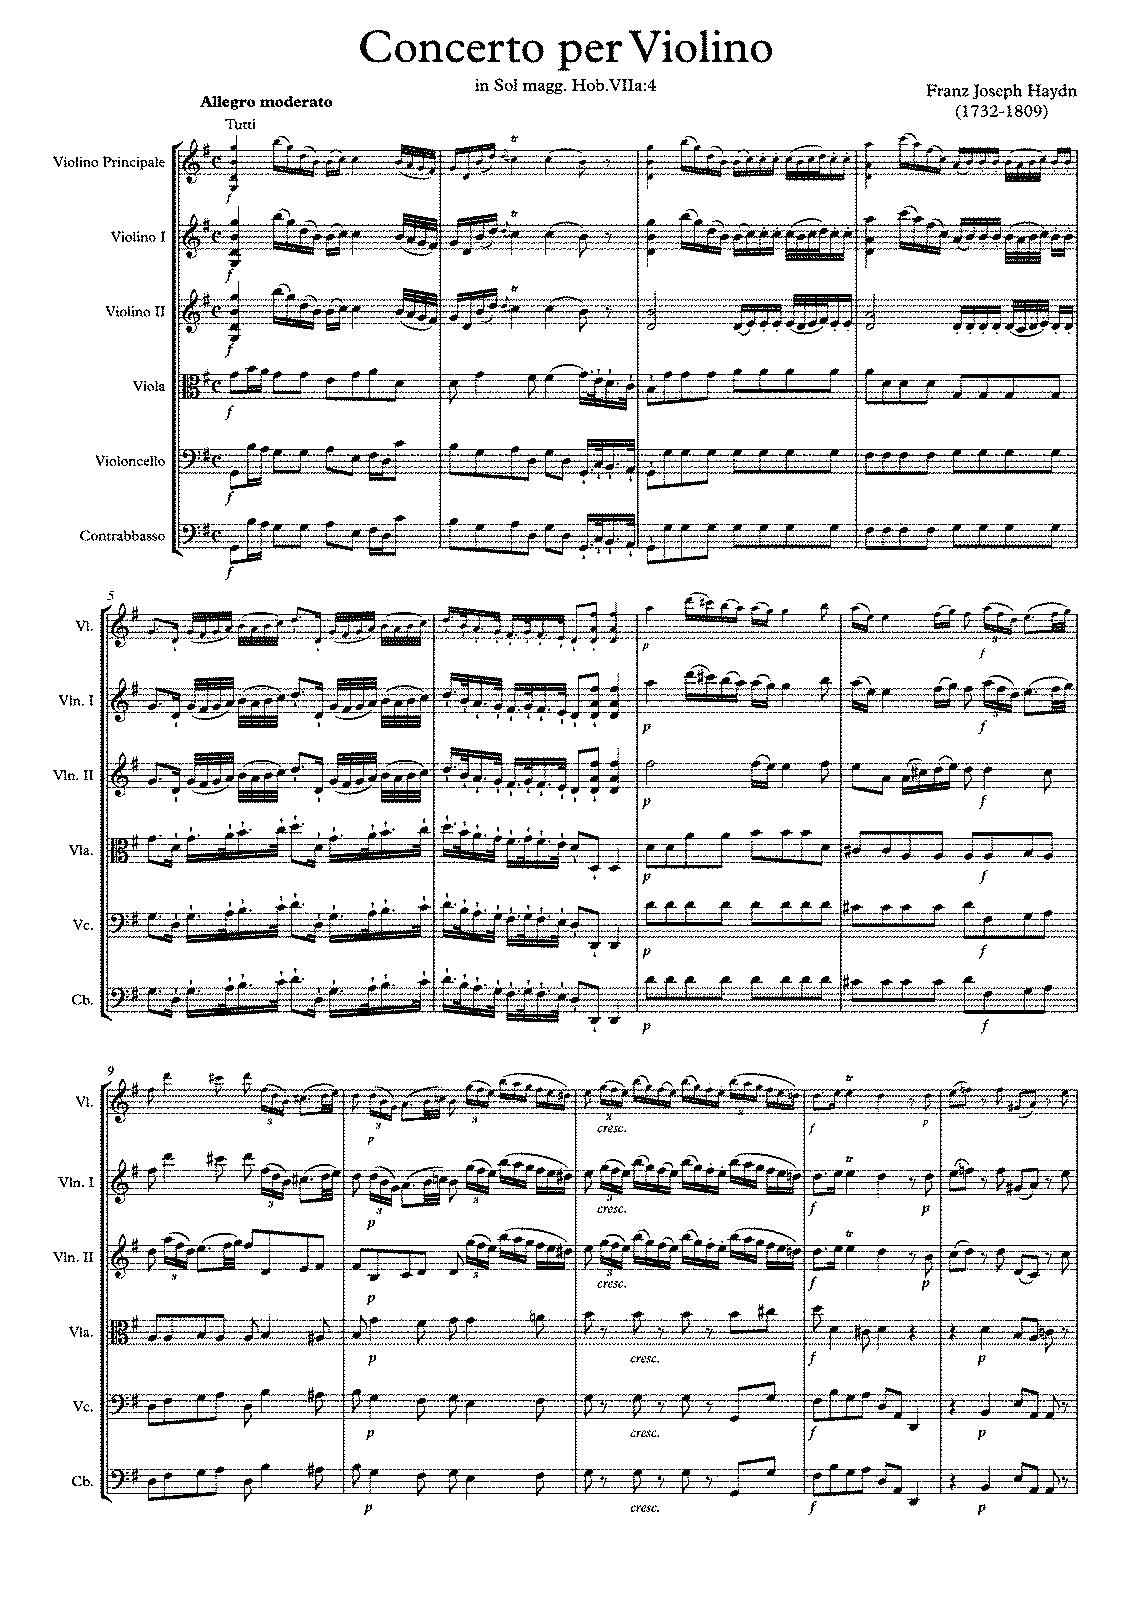 Violin Concerto in G major, Hob.VIIa:4 (Haydn, Joseph